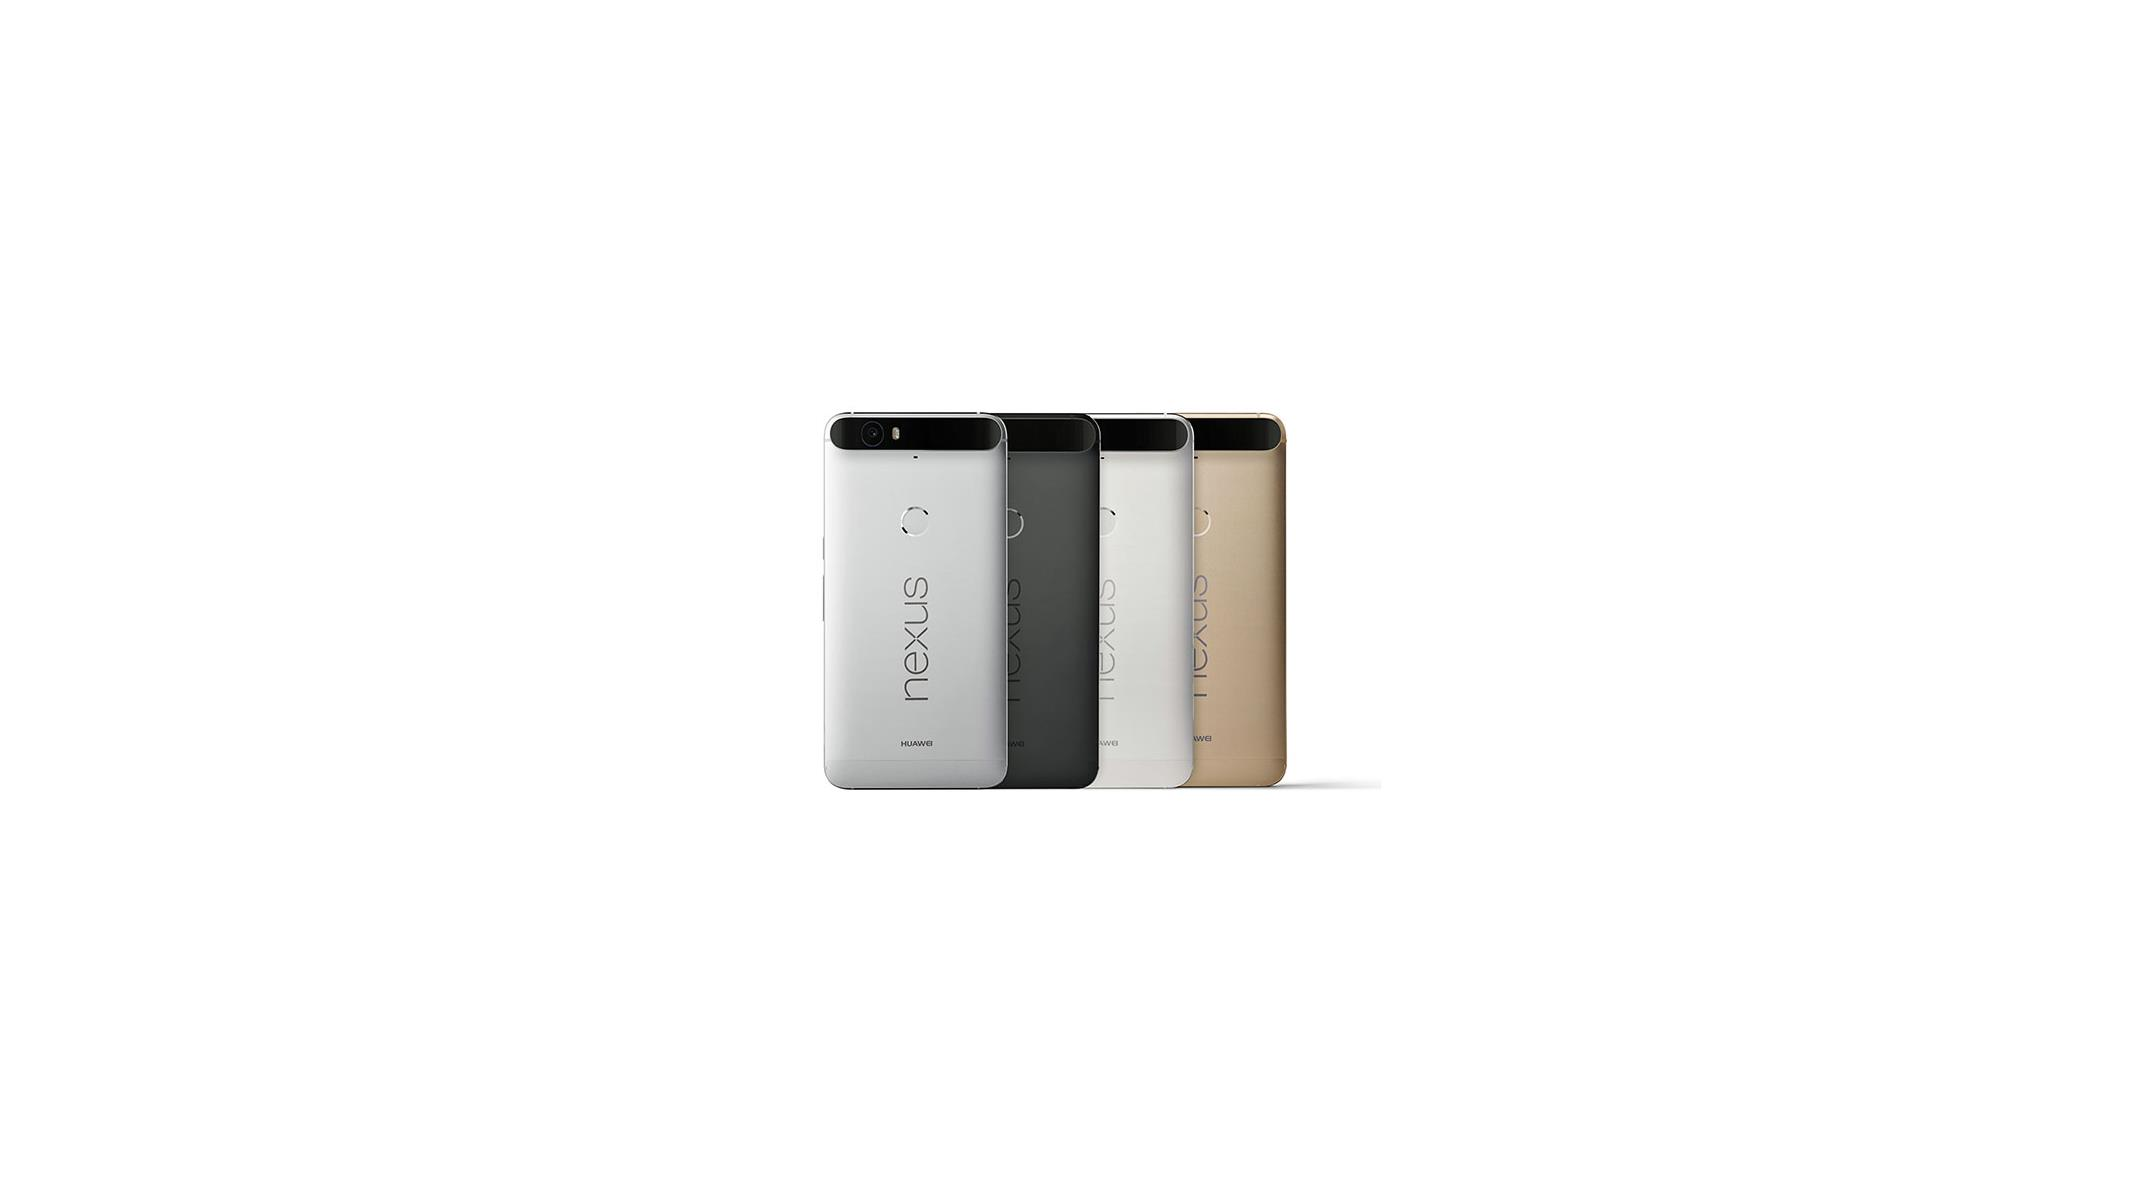 Here's How To Fix Google Nexus 6P Bootloop Of Death Errors | HotHardware